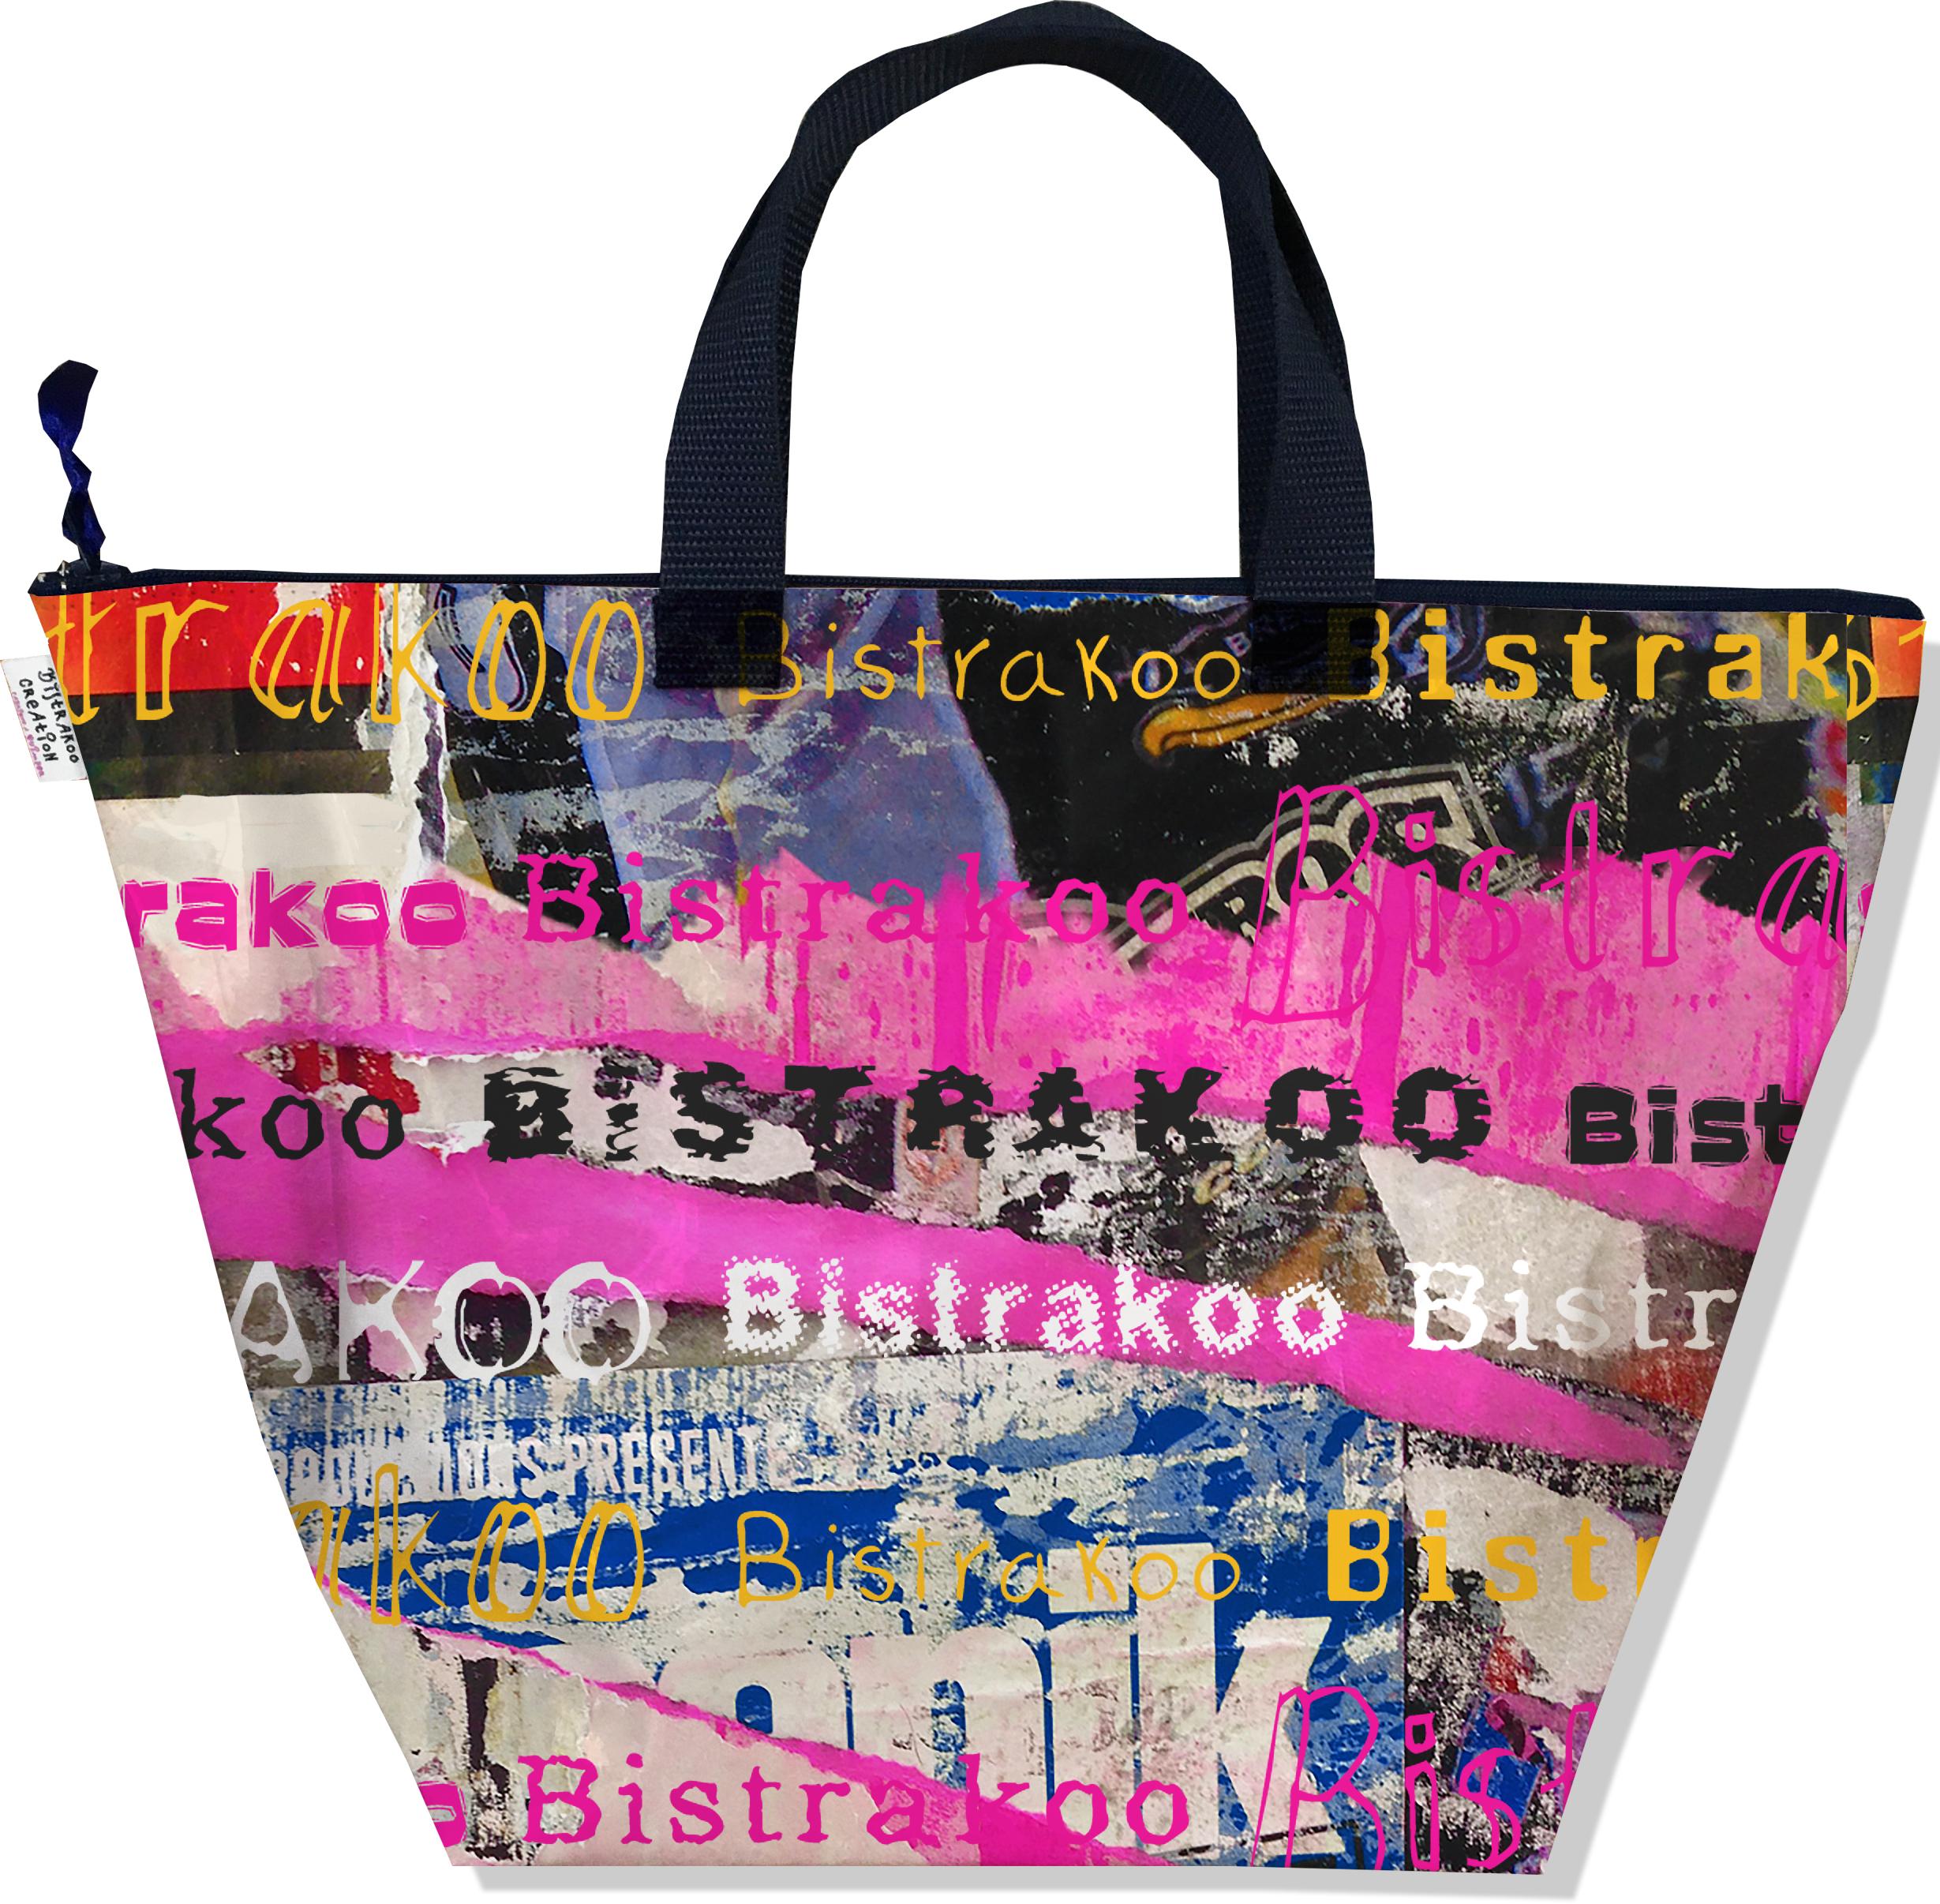 Sac à main zippé pour femme motif Street art Bistrakoo 2290